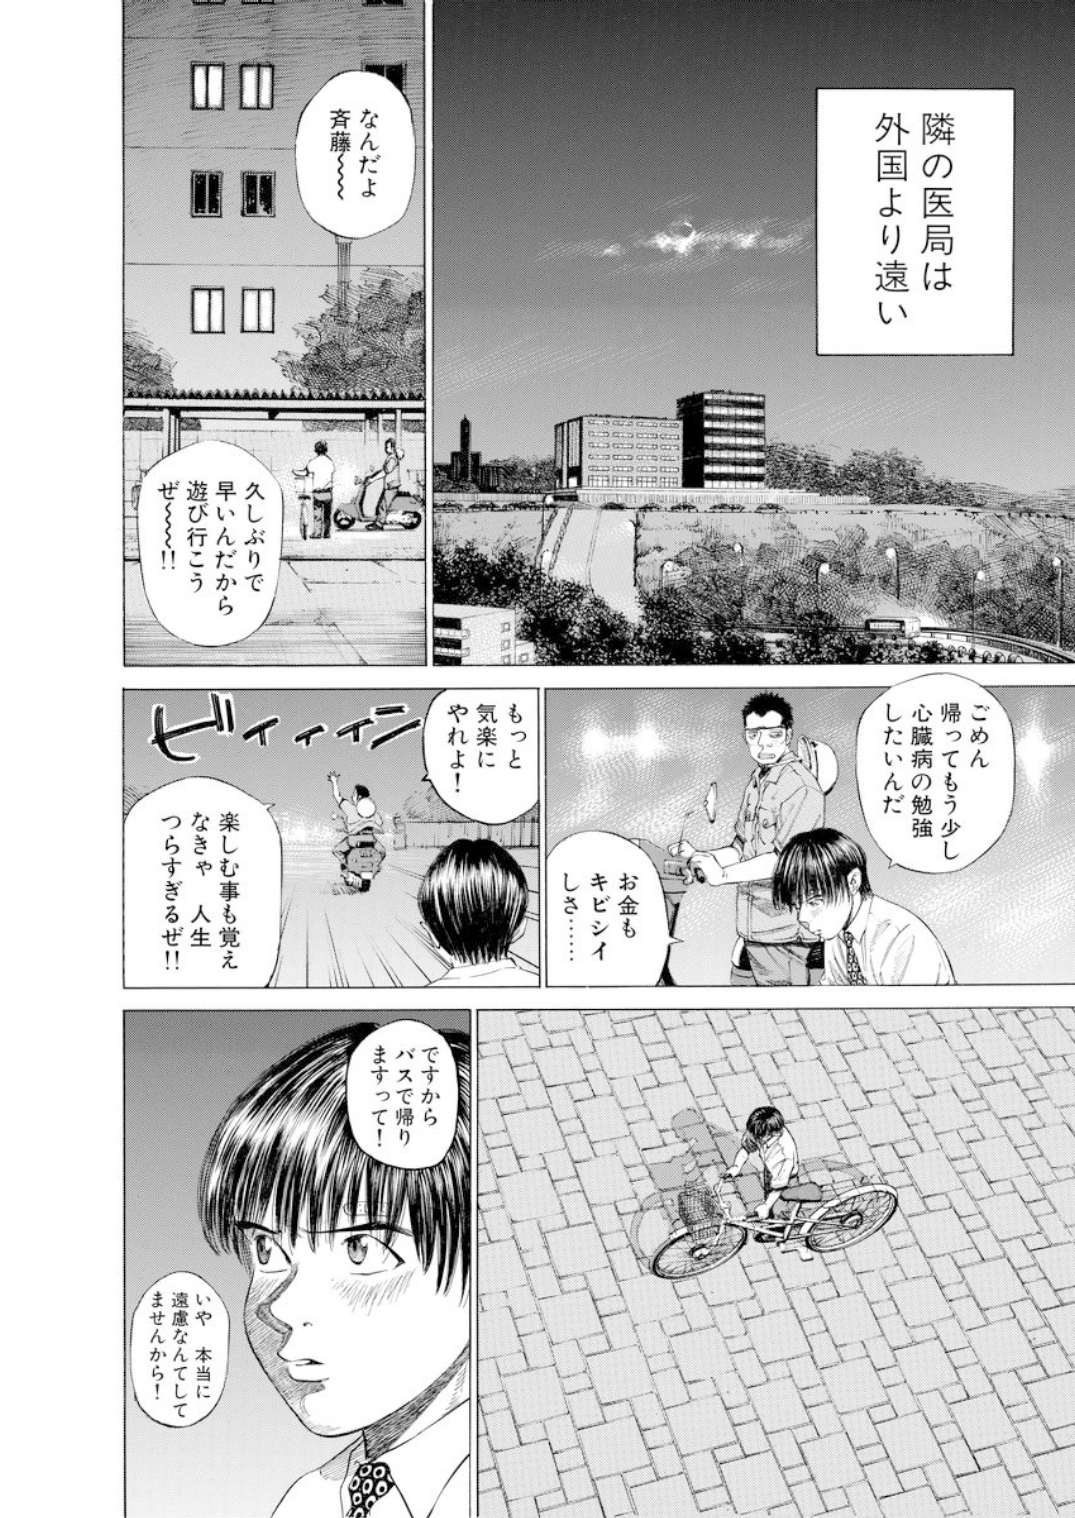 001bj_page-0200.jpg